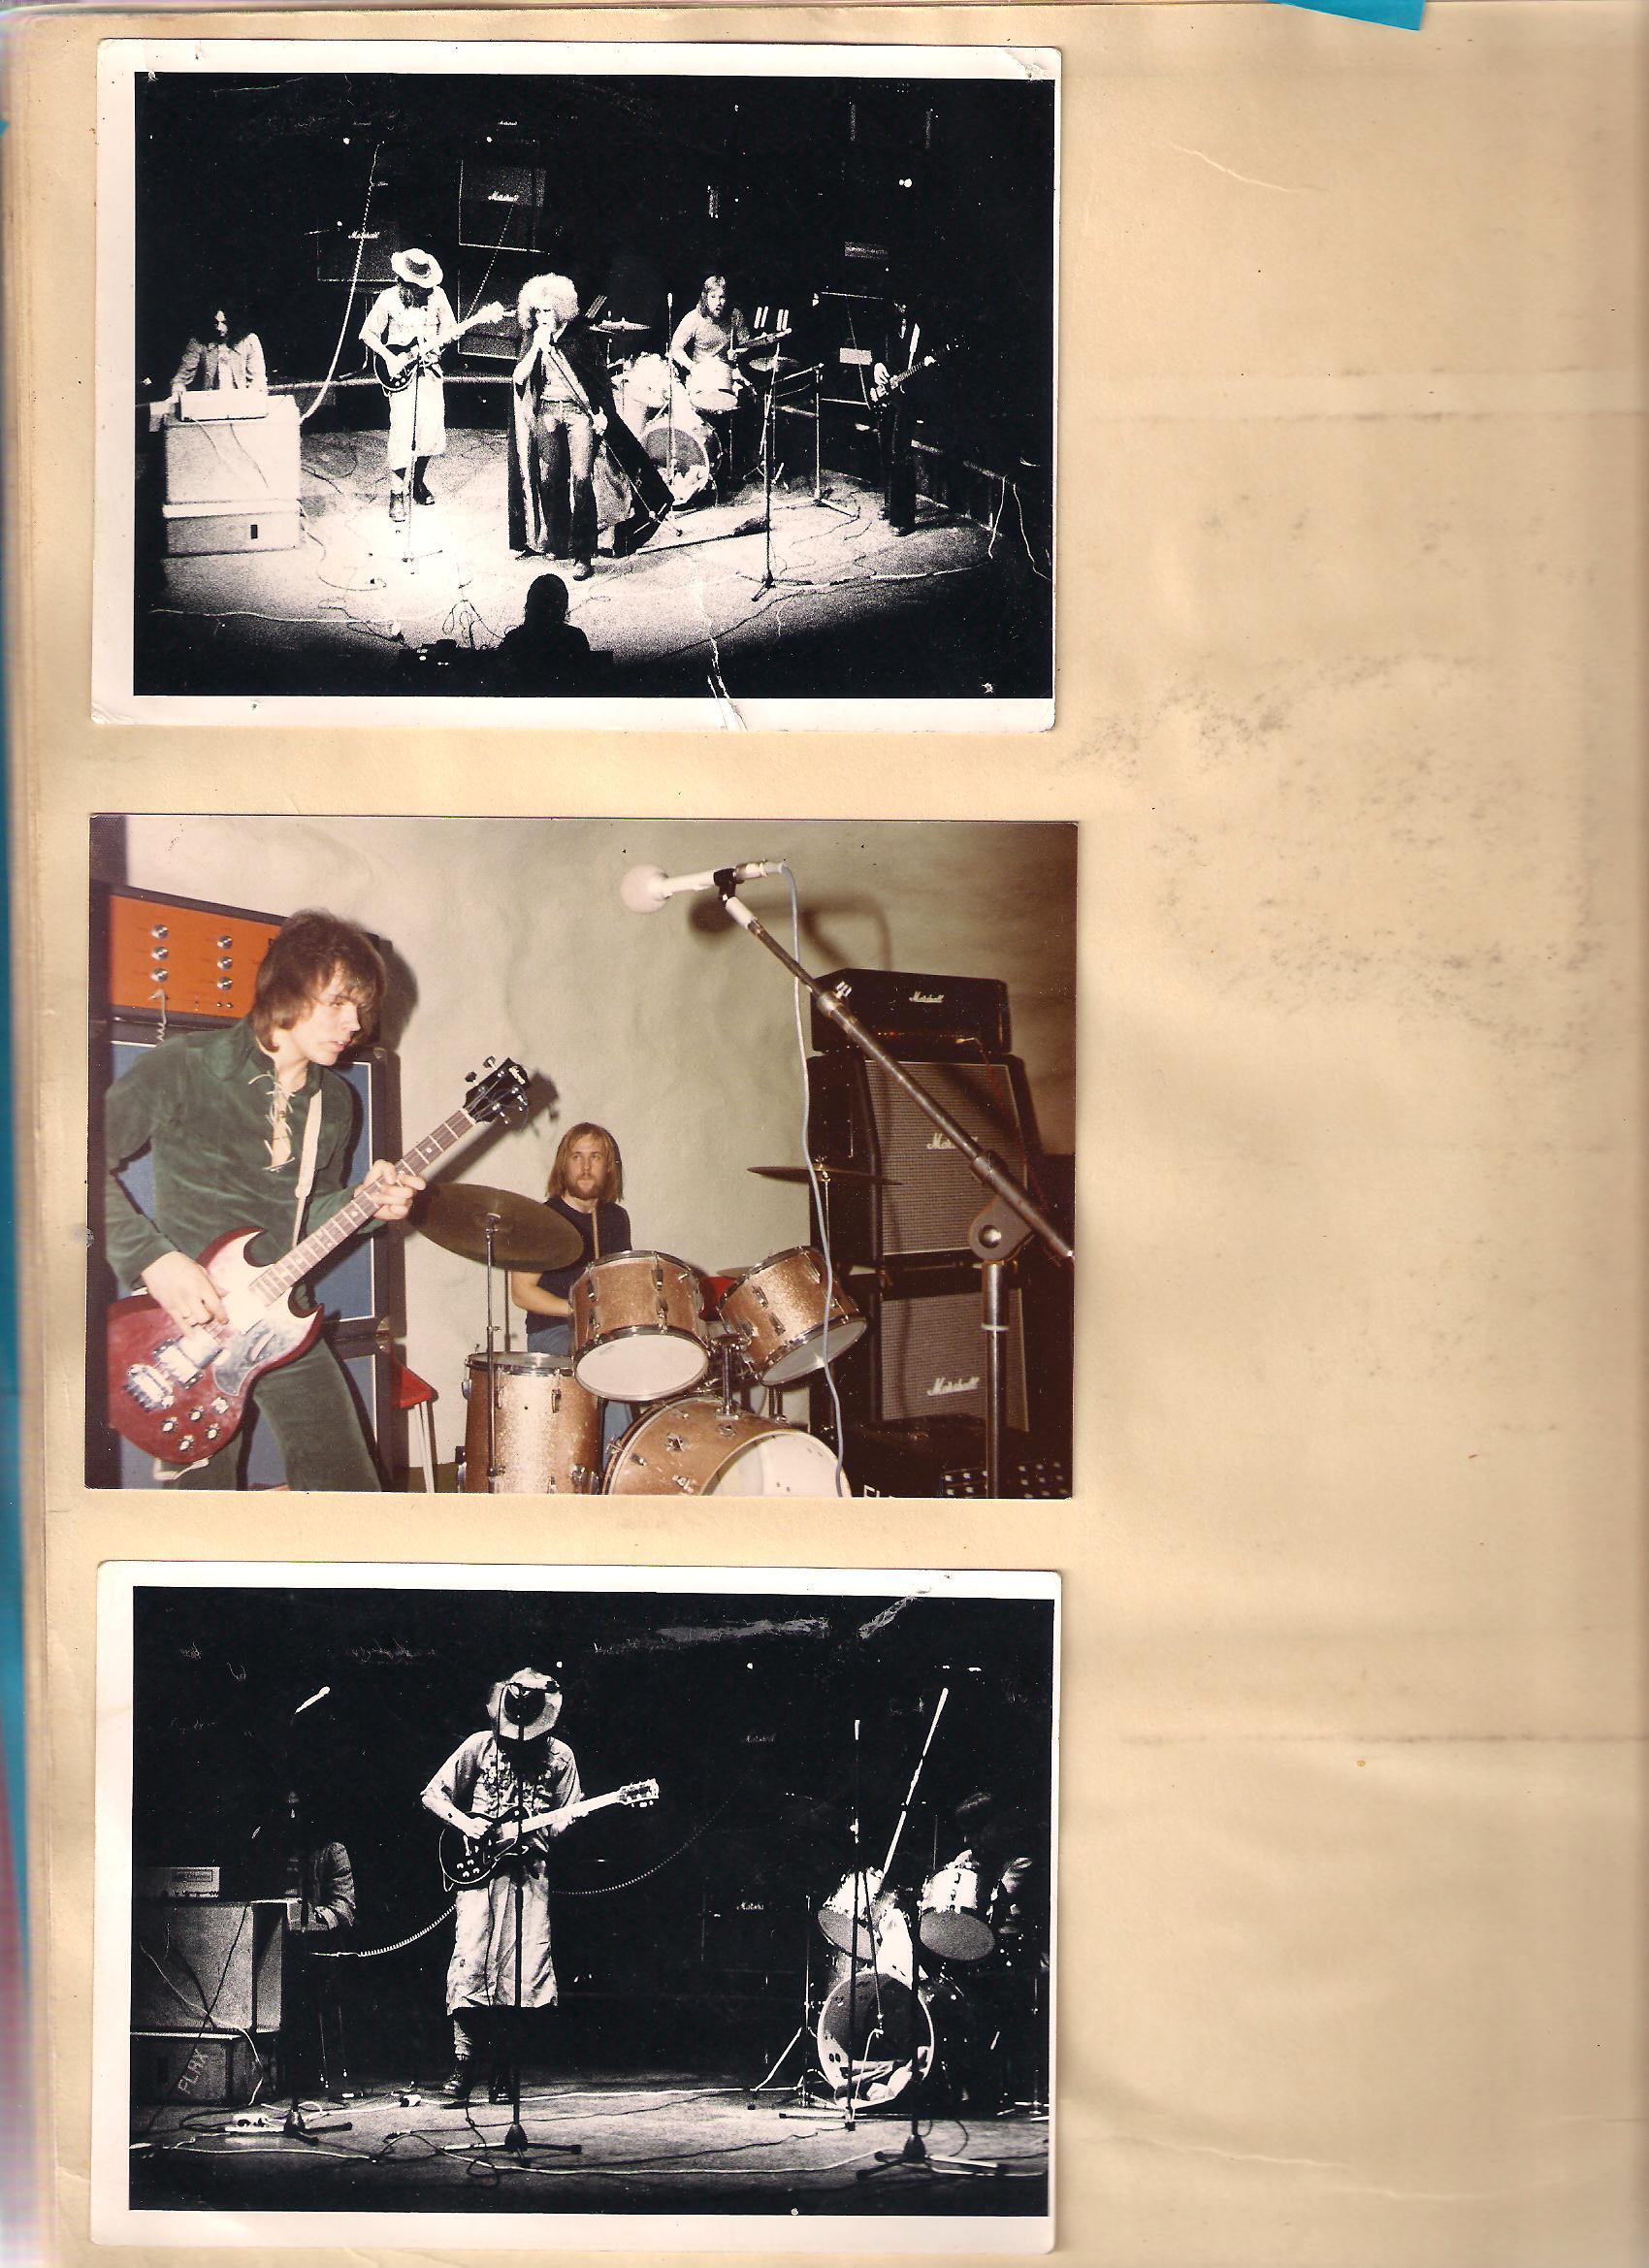 Flax 1973-74